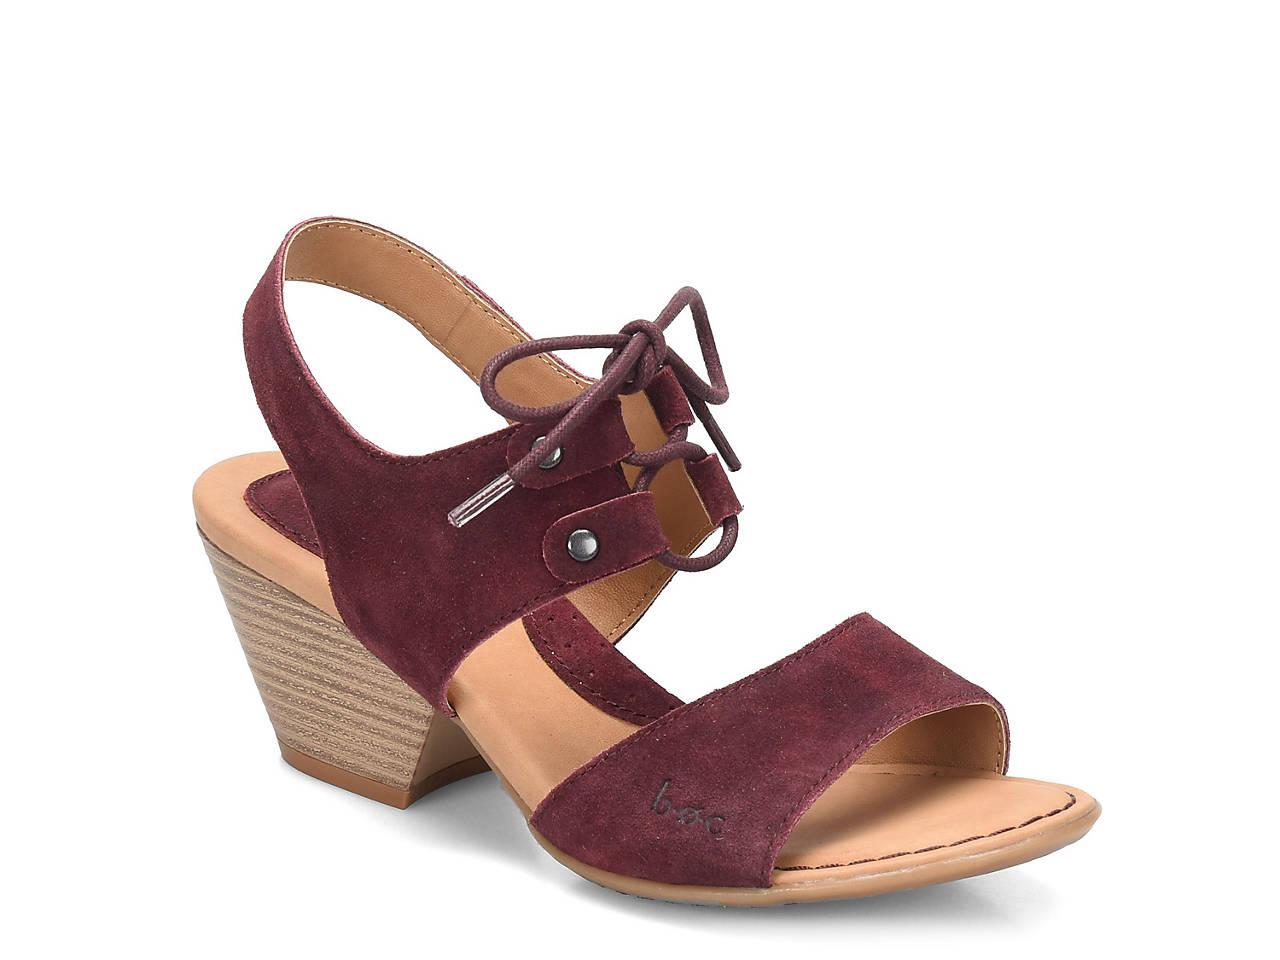 95db7fd0dd0c05 b.o.c Blaire Sandal Women s Shoes